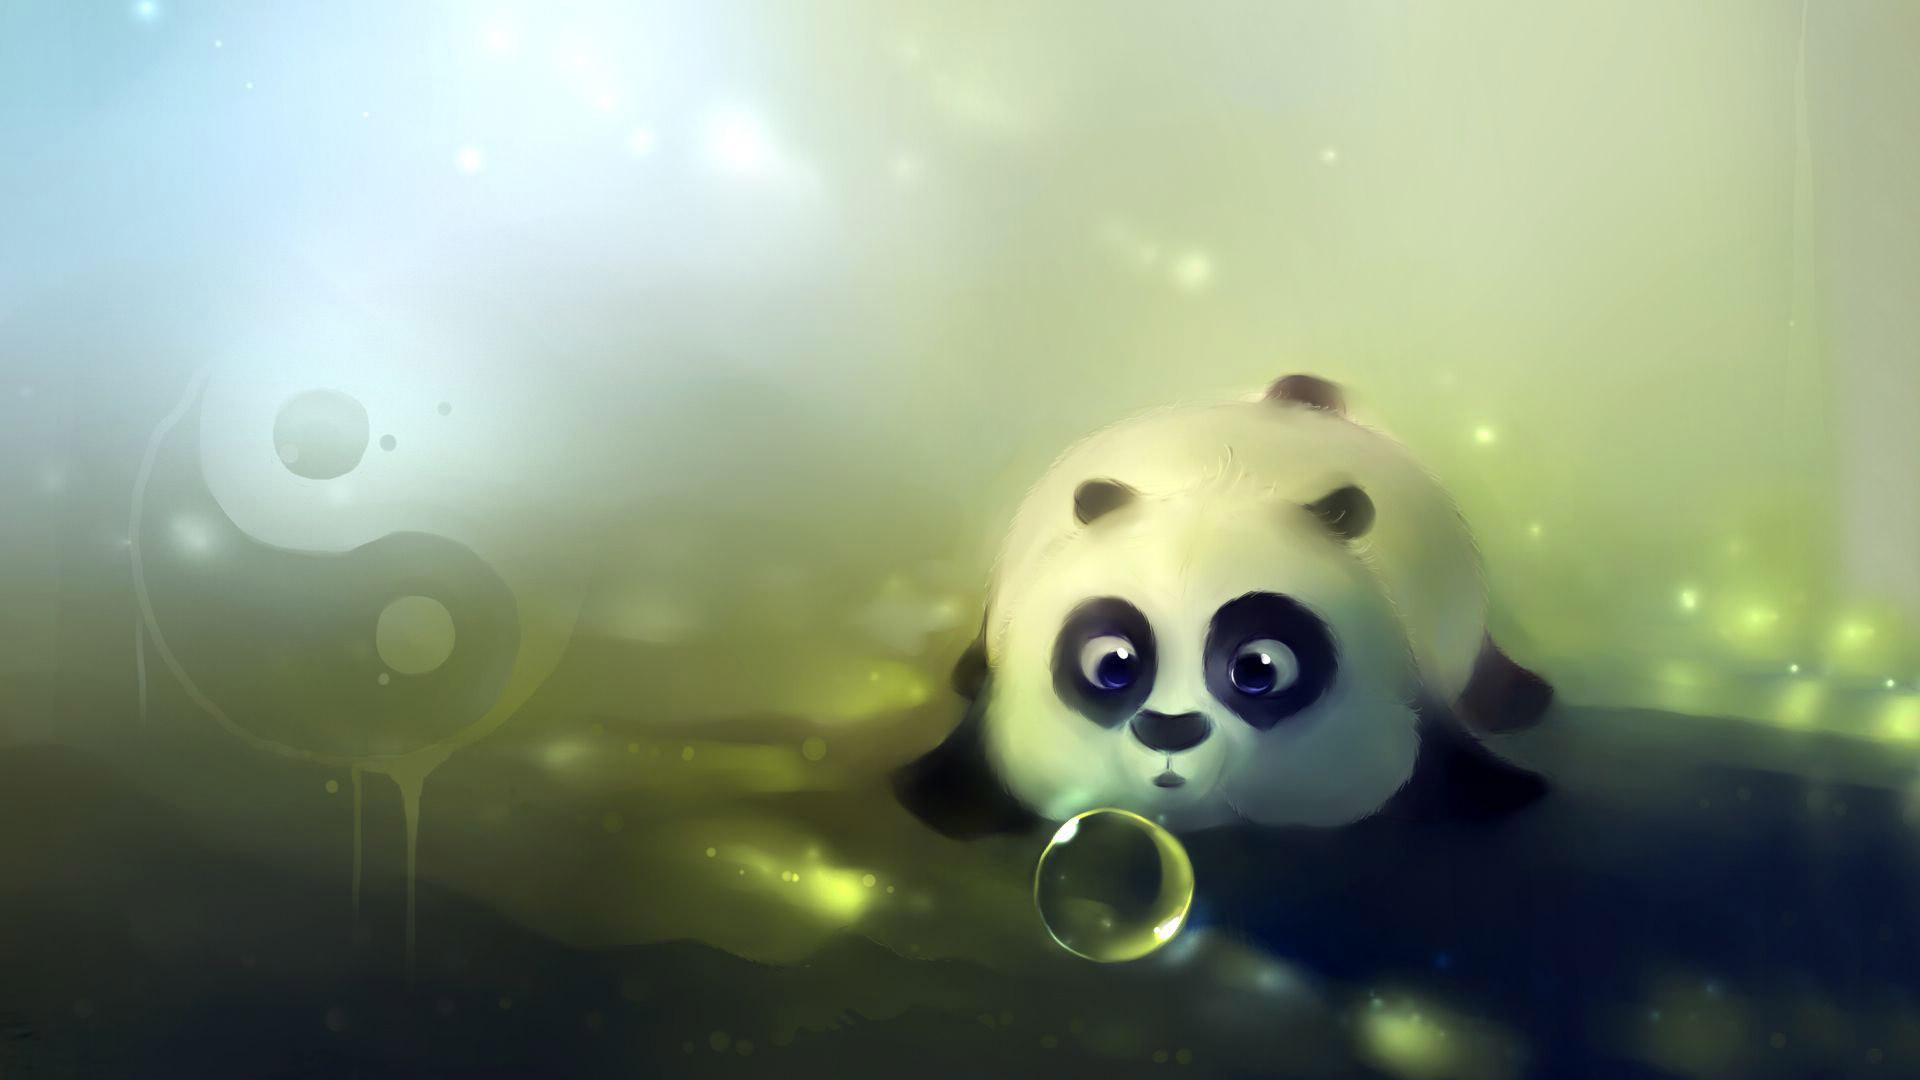 Fonds d'écran Panda : tous les wallpapers Panda